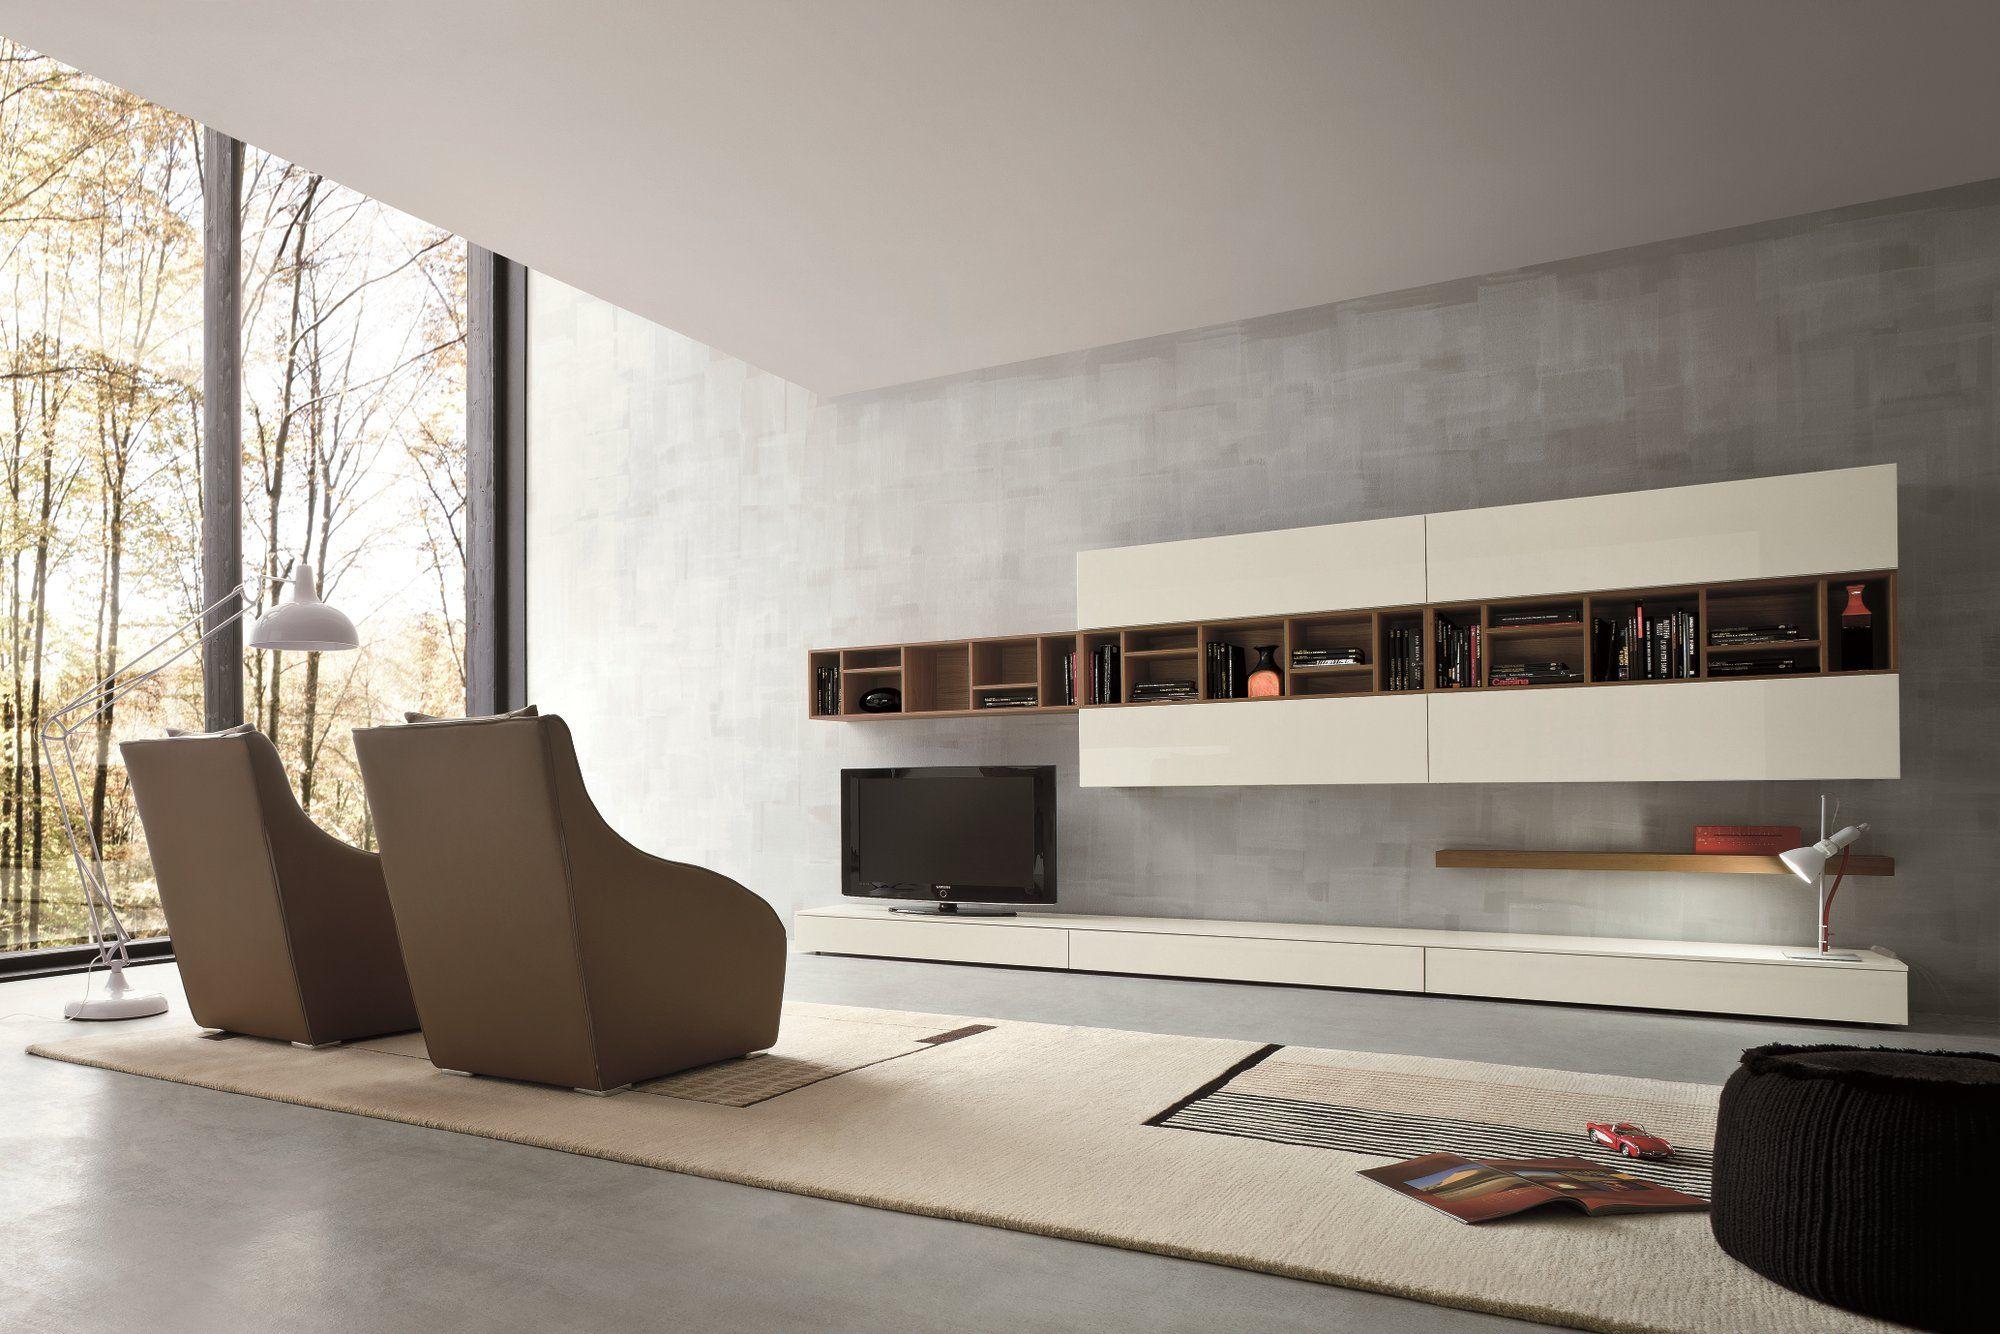 Wohnwand Italian Design | nzcen.com